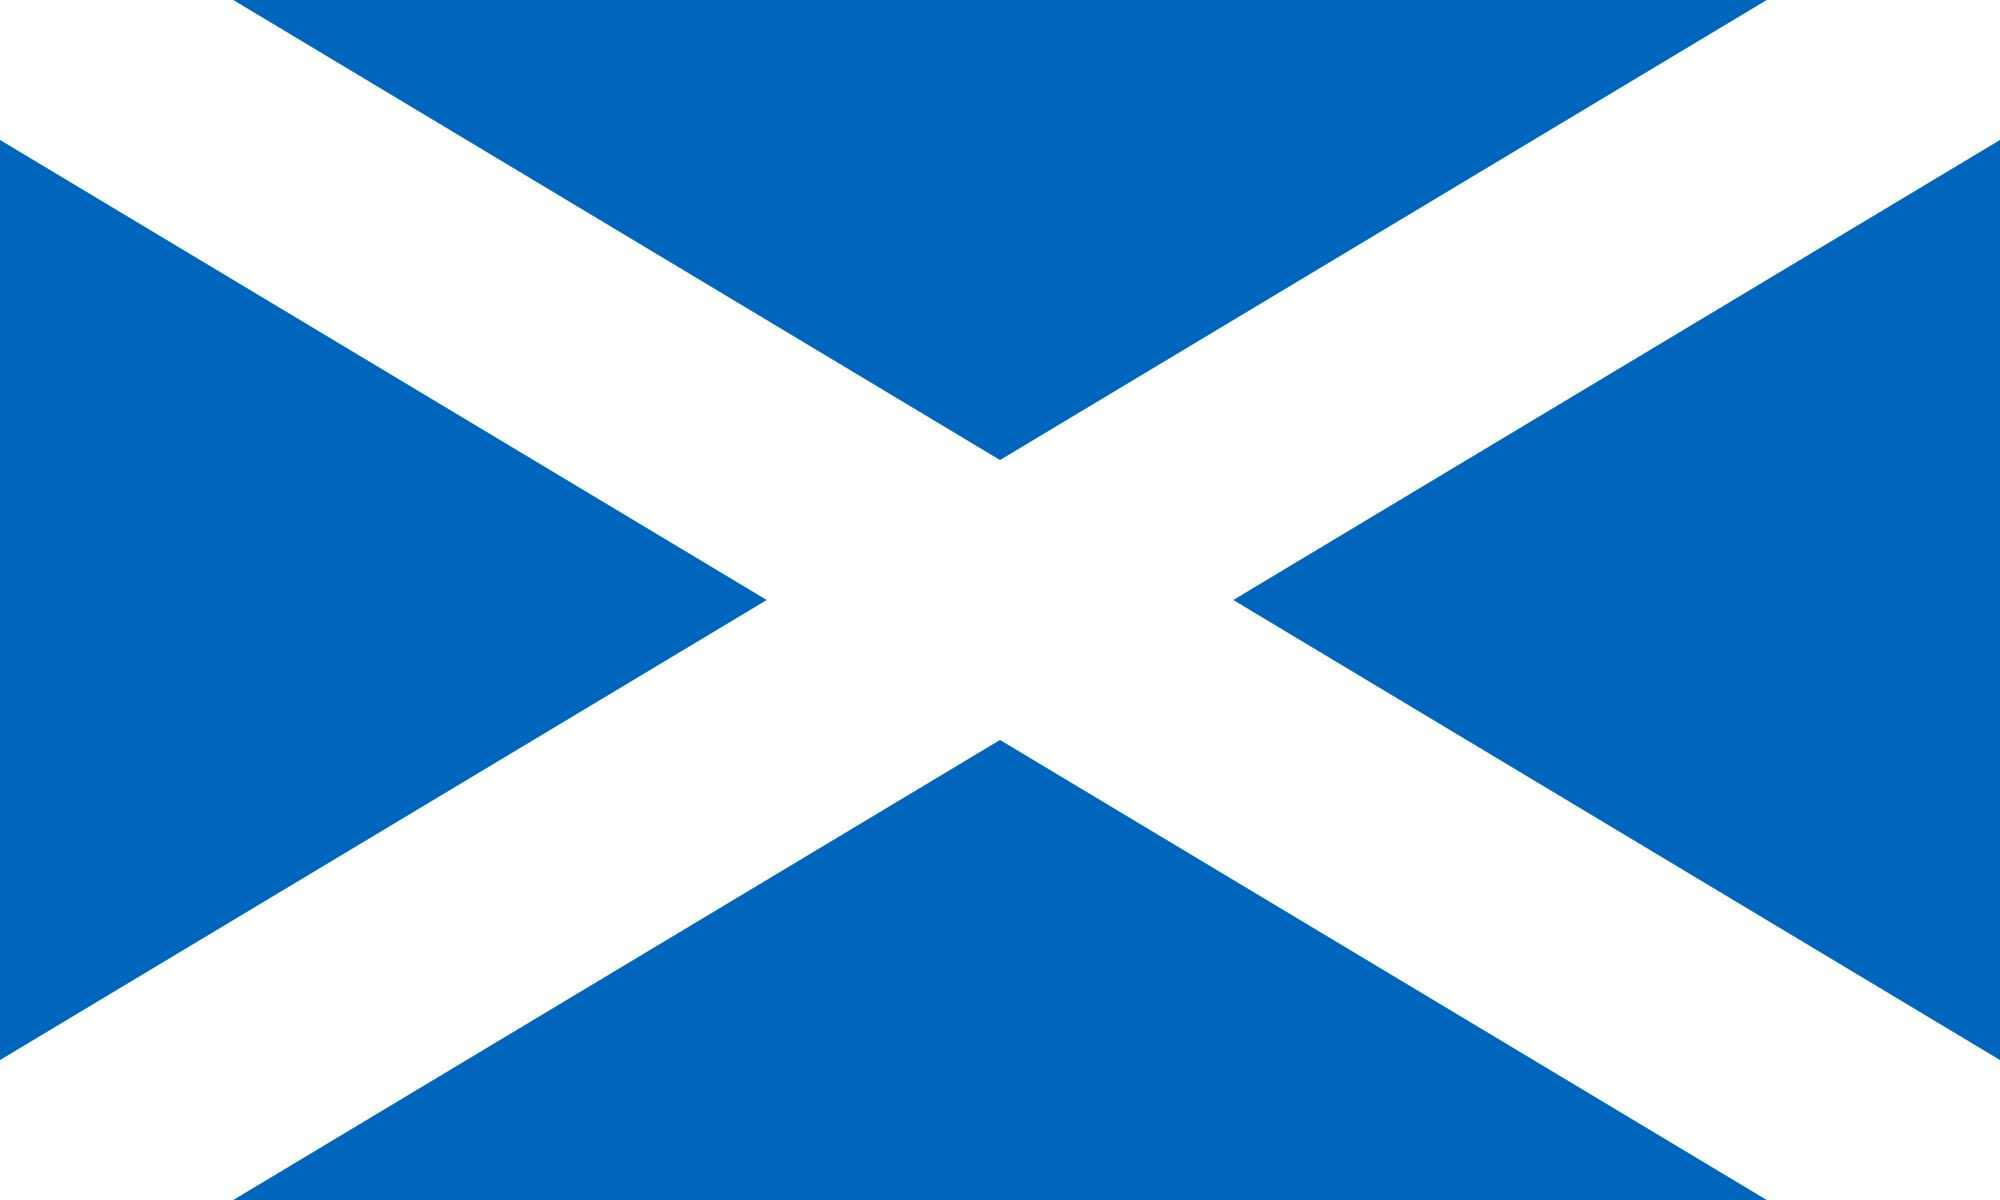 Scottish County Championship 2018 World Snooker